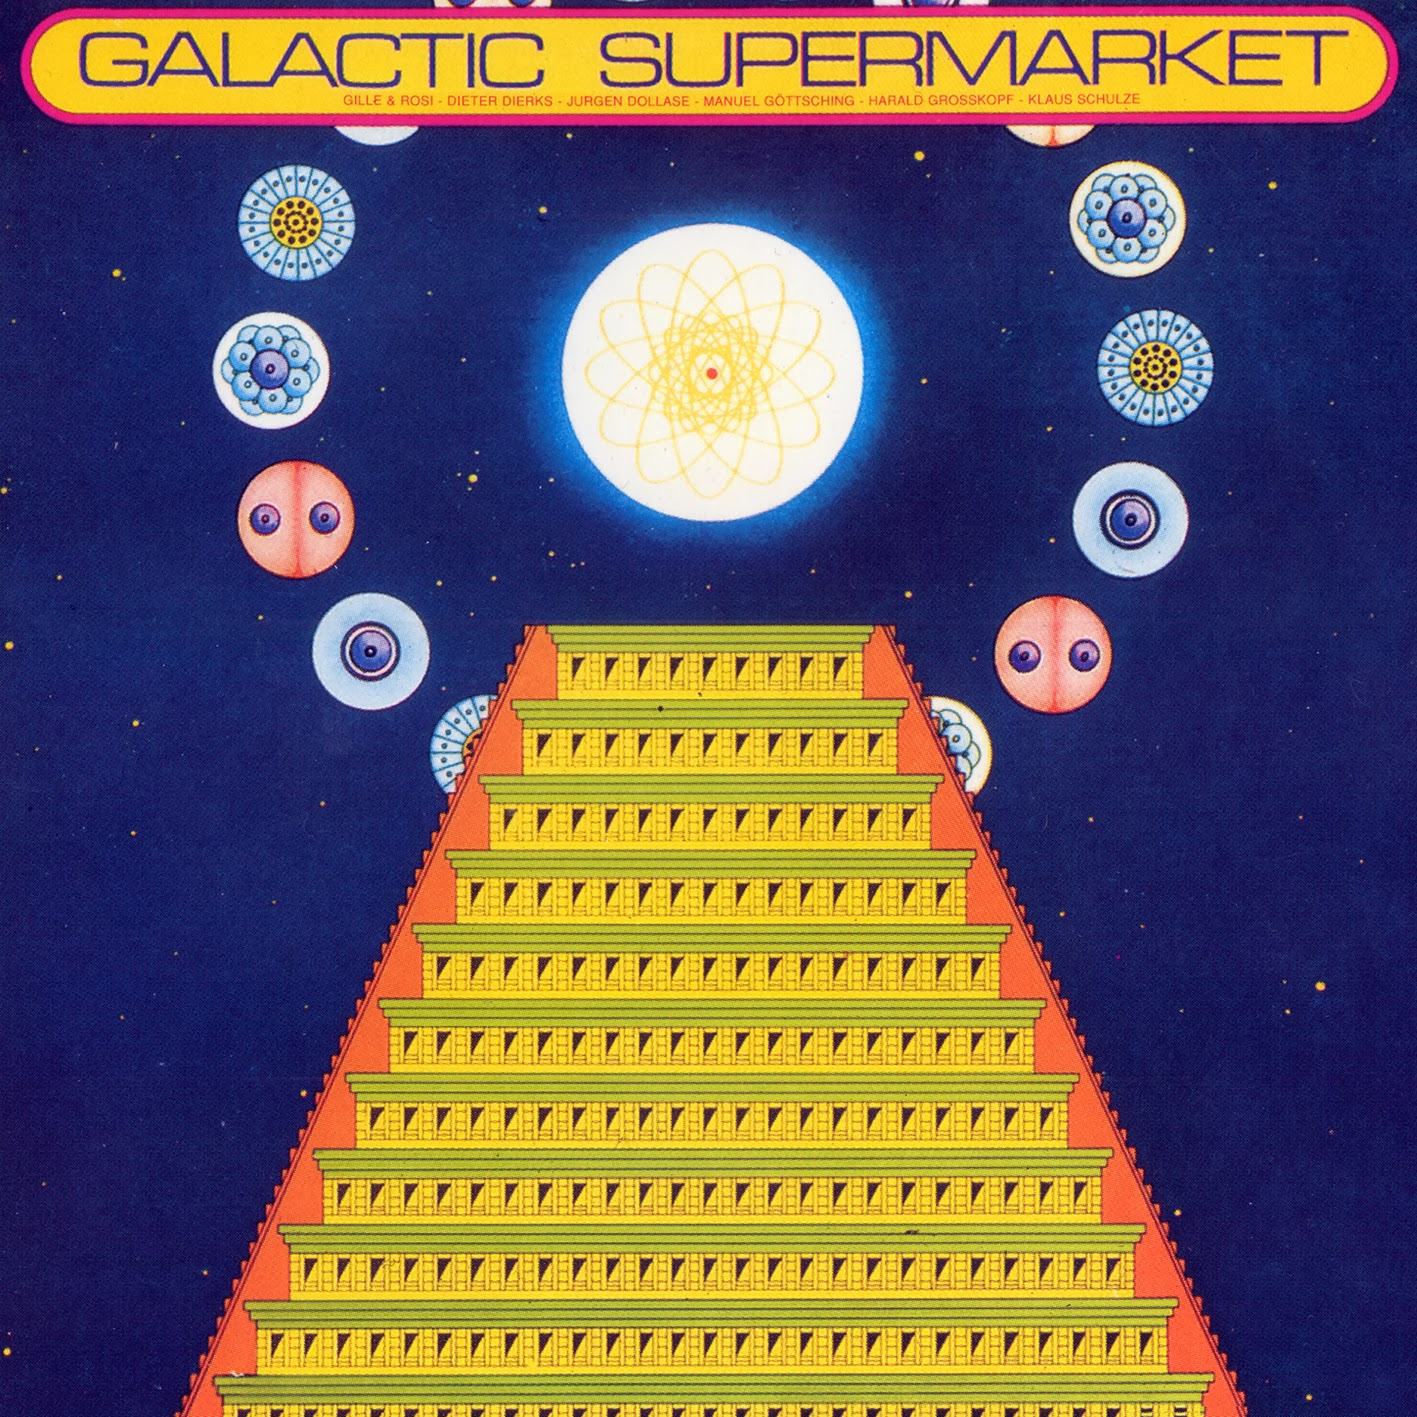 Cosmic Jokers Galactic Supermarket